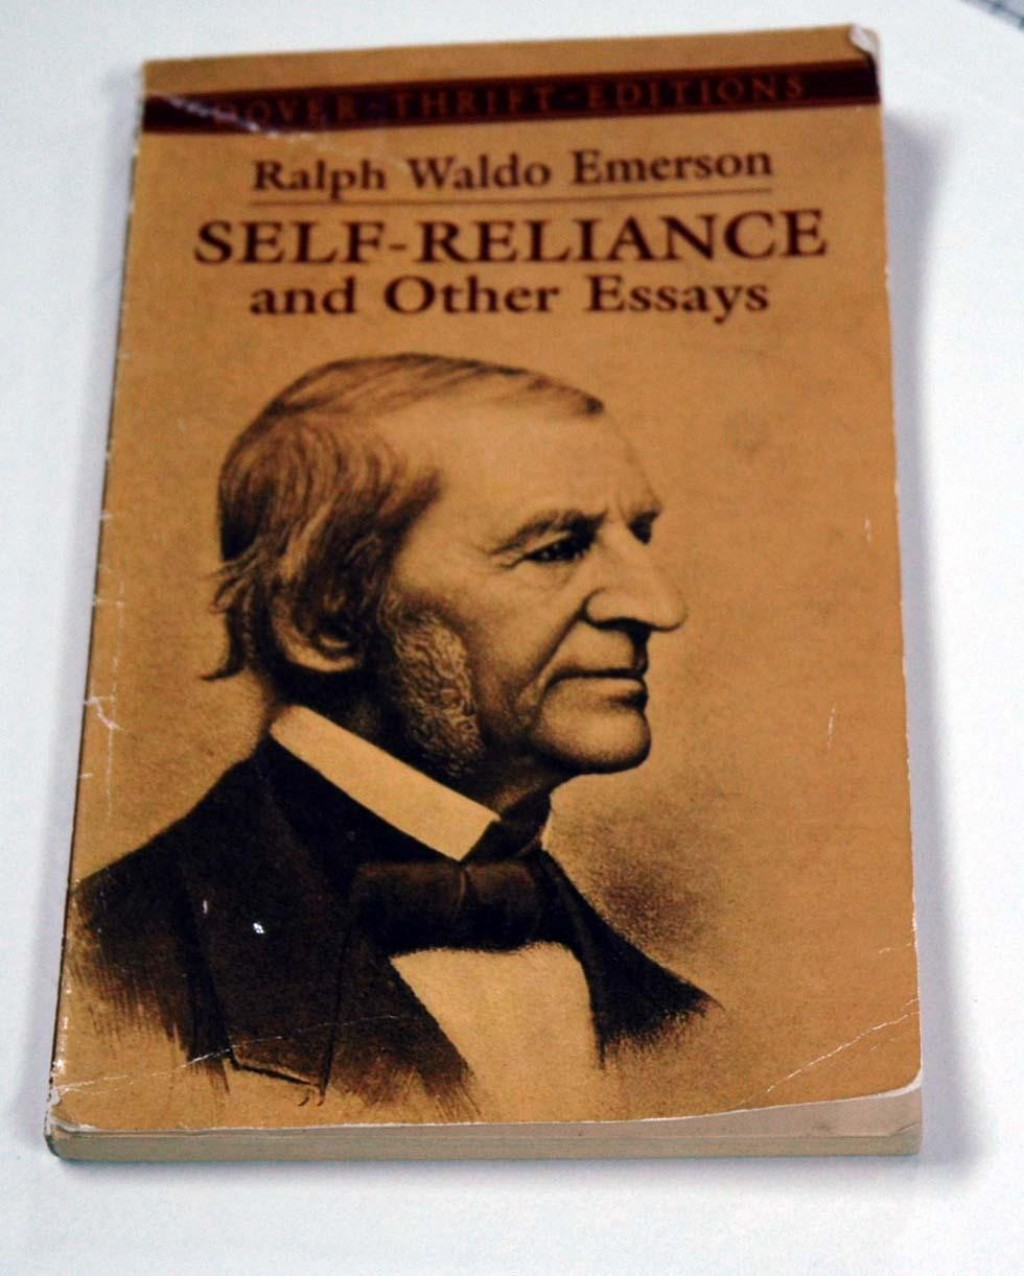 002 Self Reliance And Other Essays Essay Formidable Ralph Waldo Emerson Pdf Ekşi Large